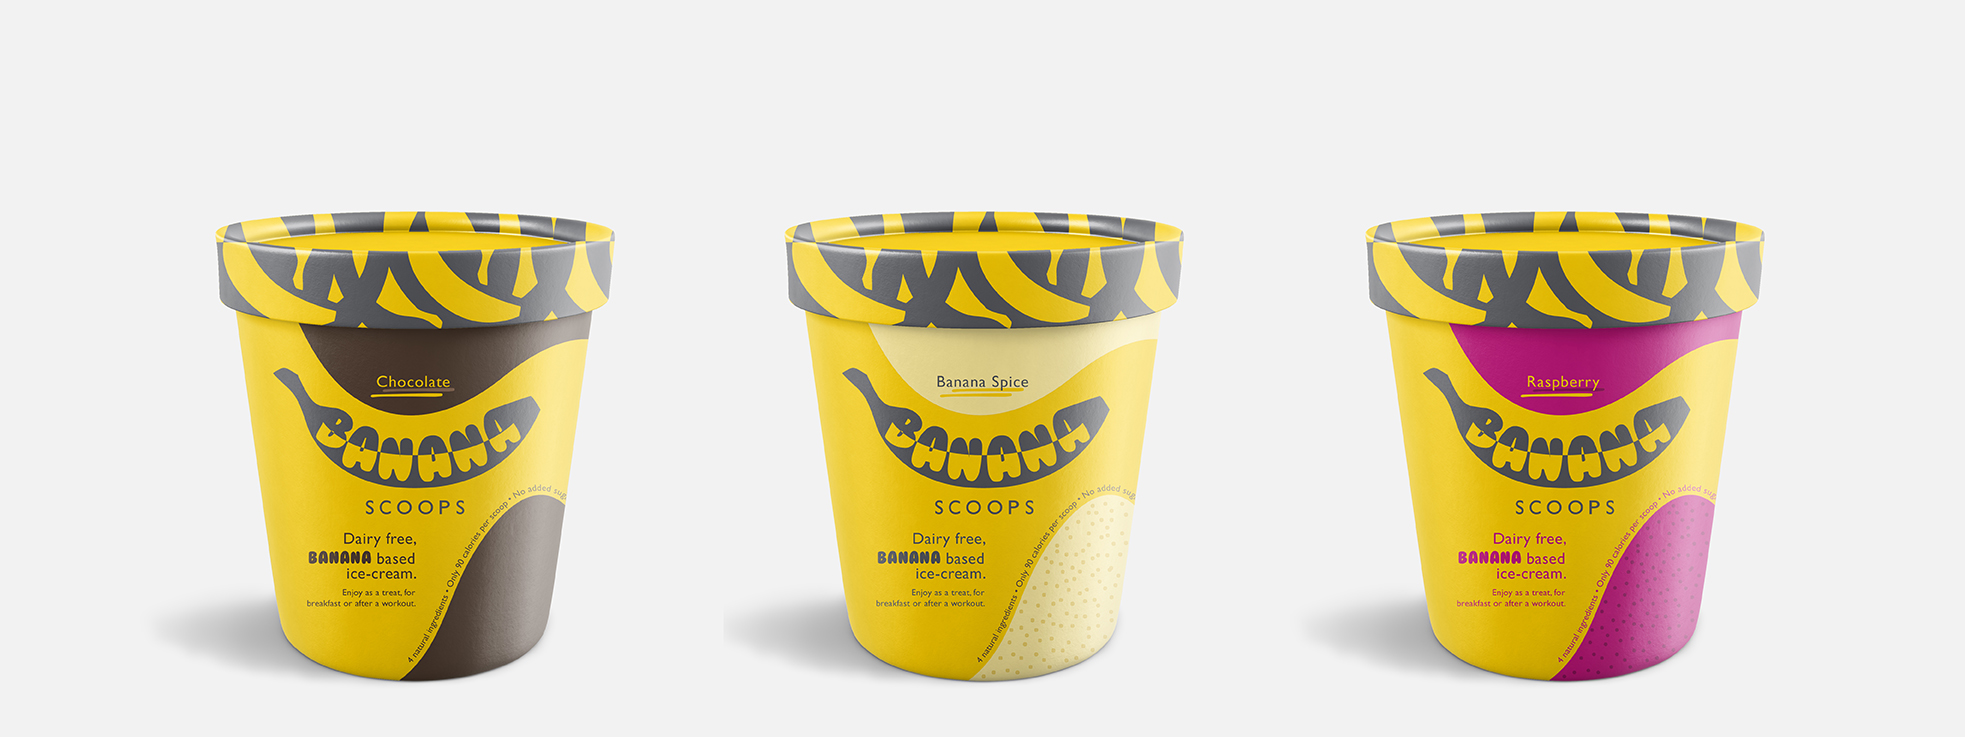 LGD_BananaScoops_Packaging_V1.01_WebRes.jpg